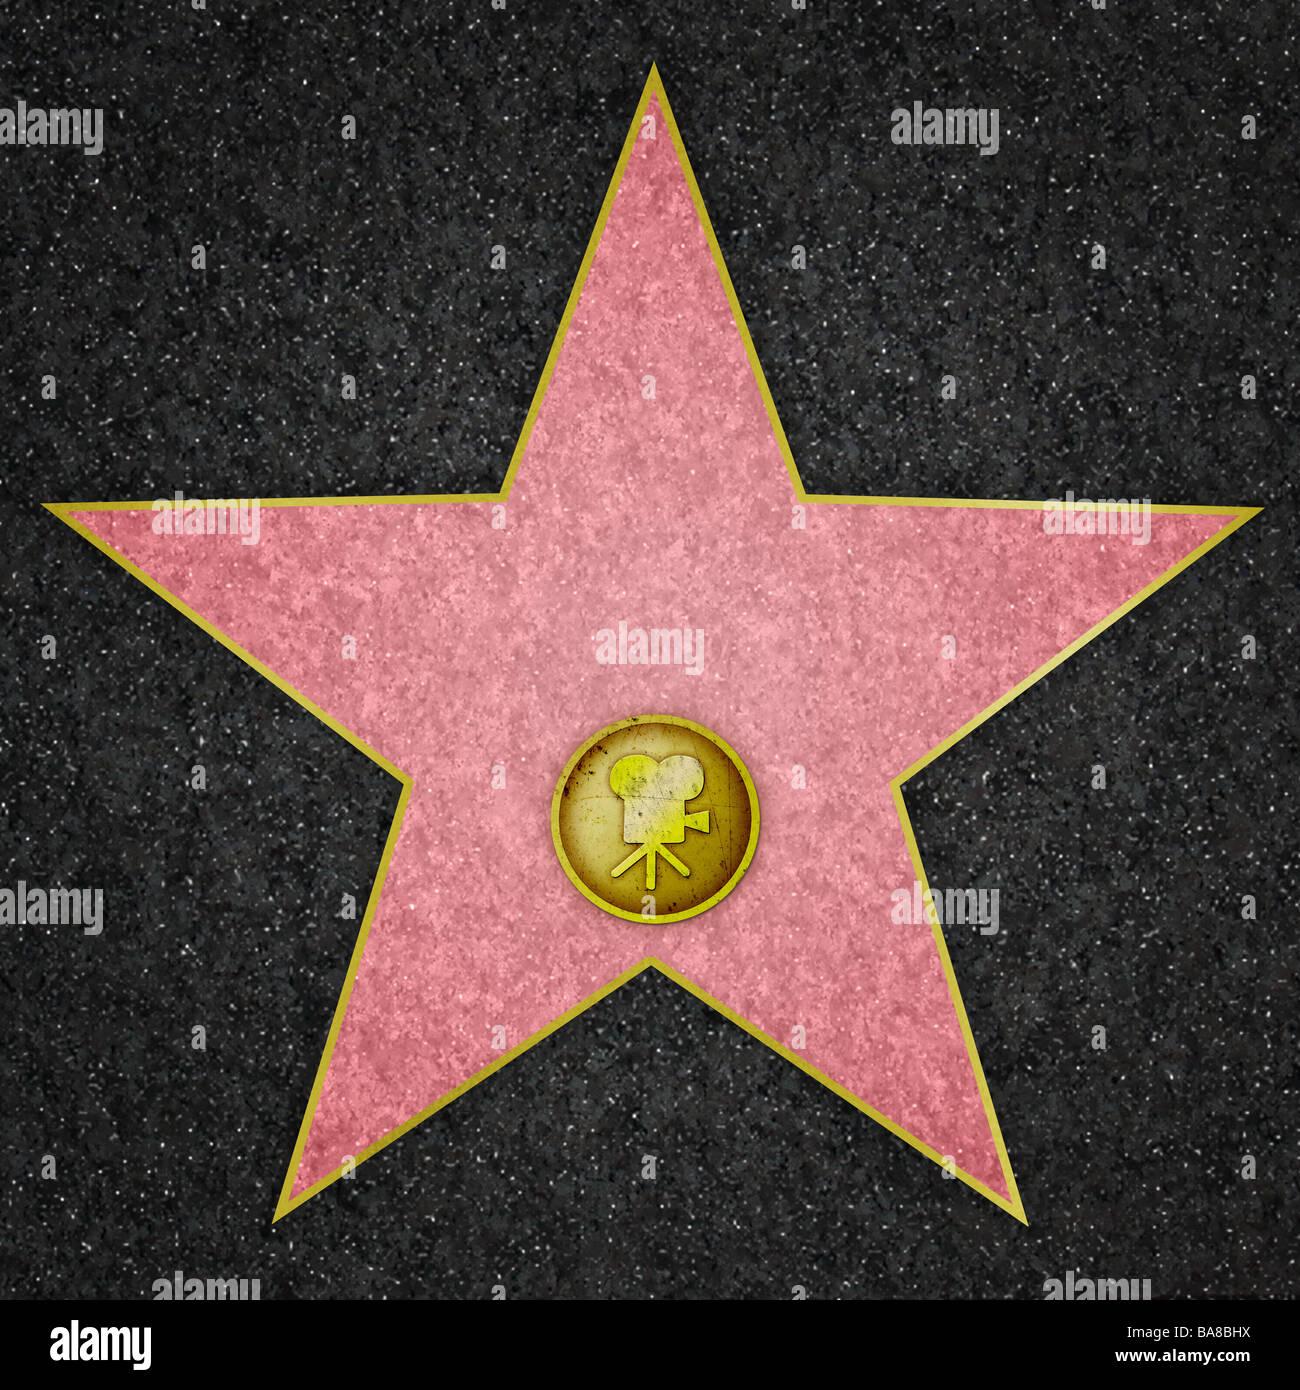 Hollywood Star Film Stockbild